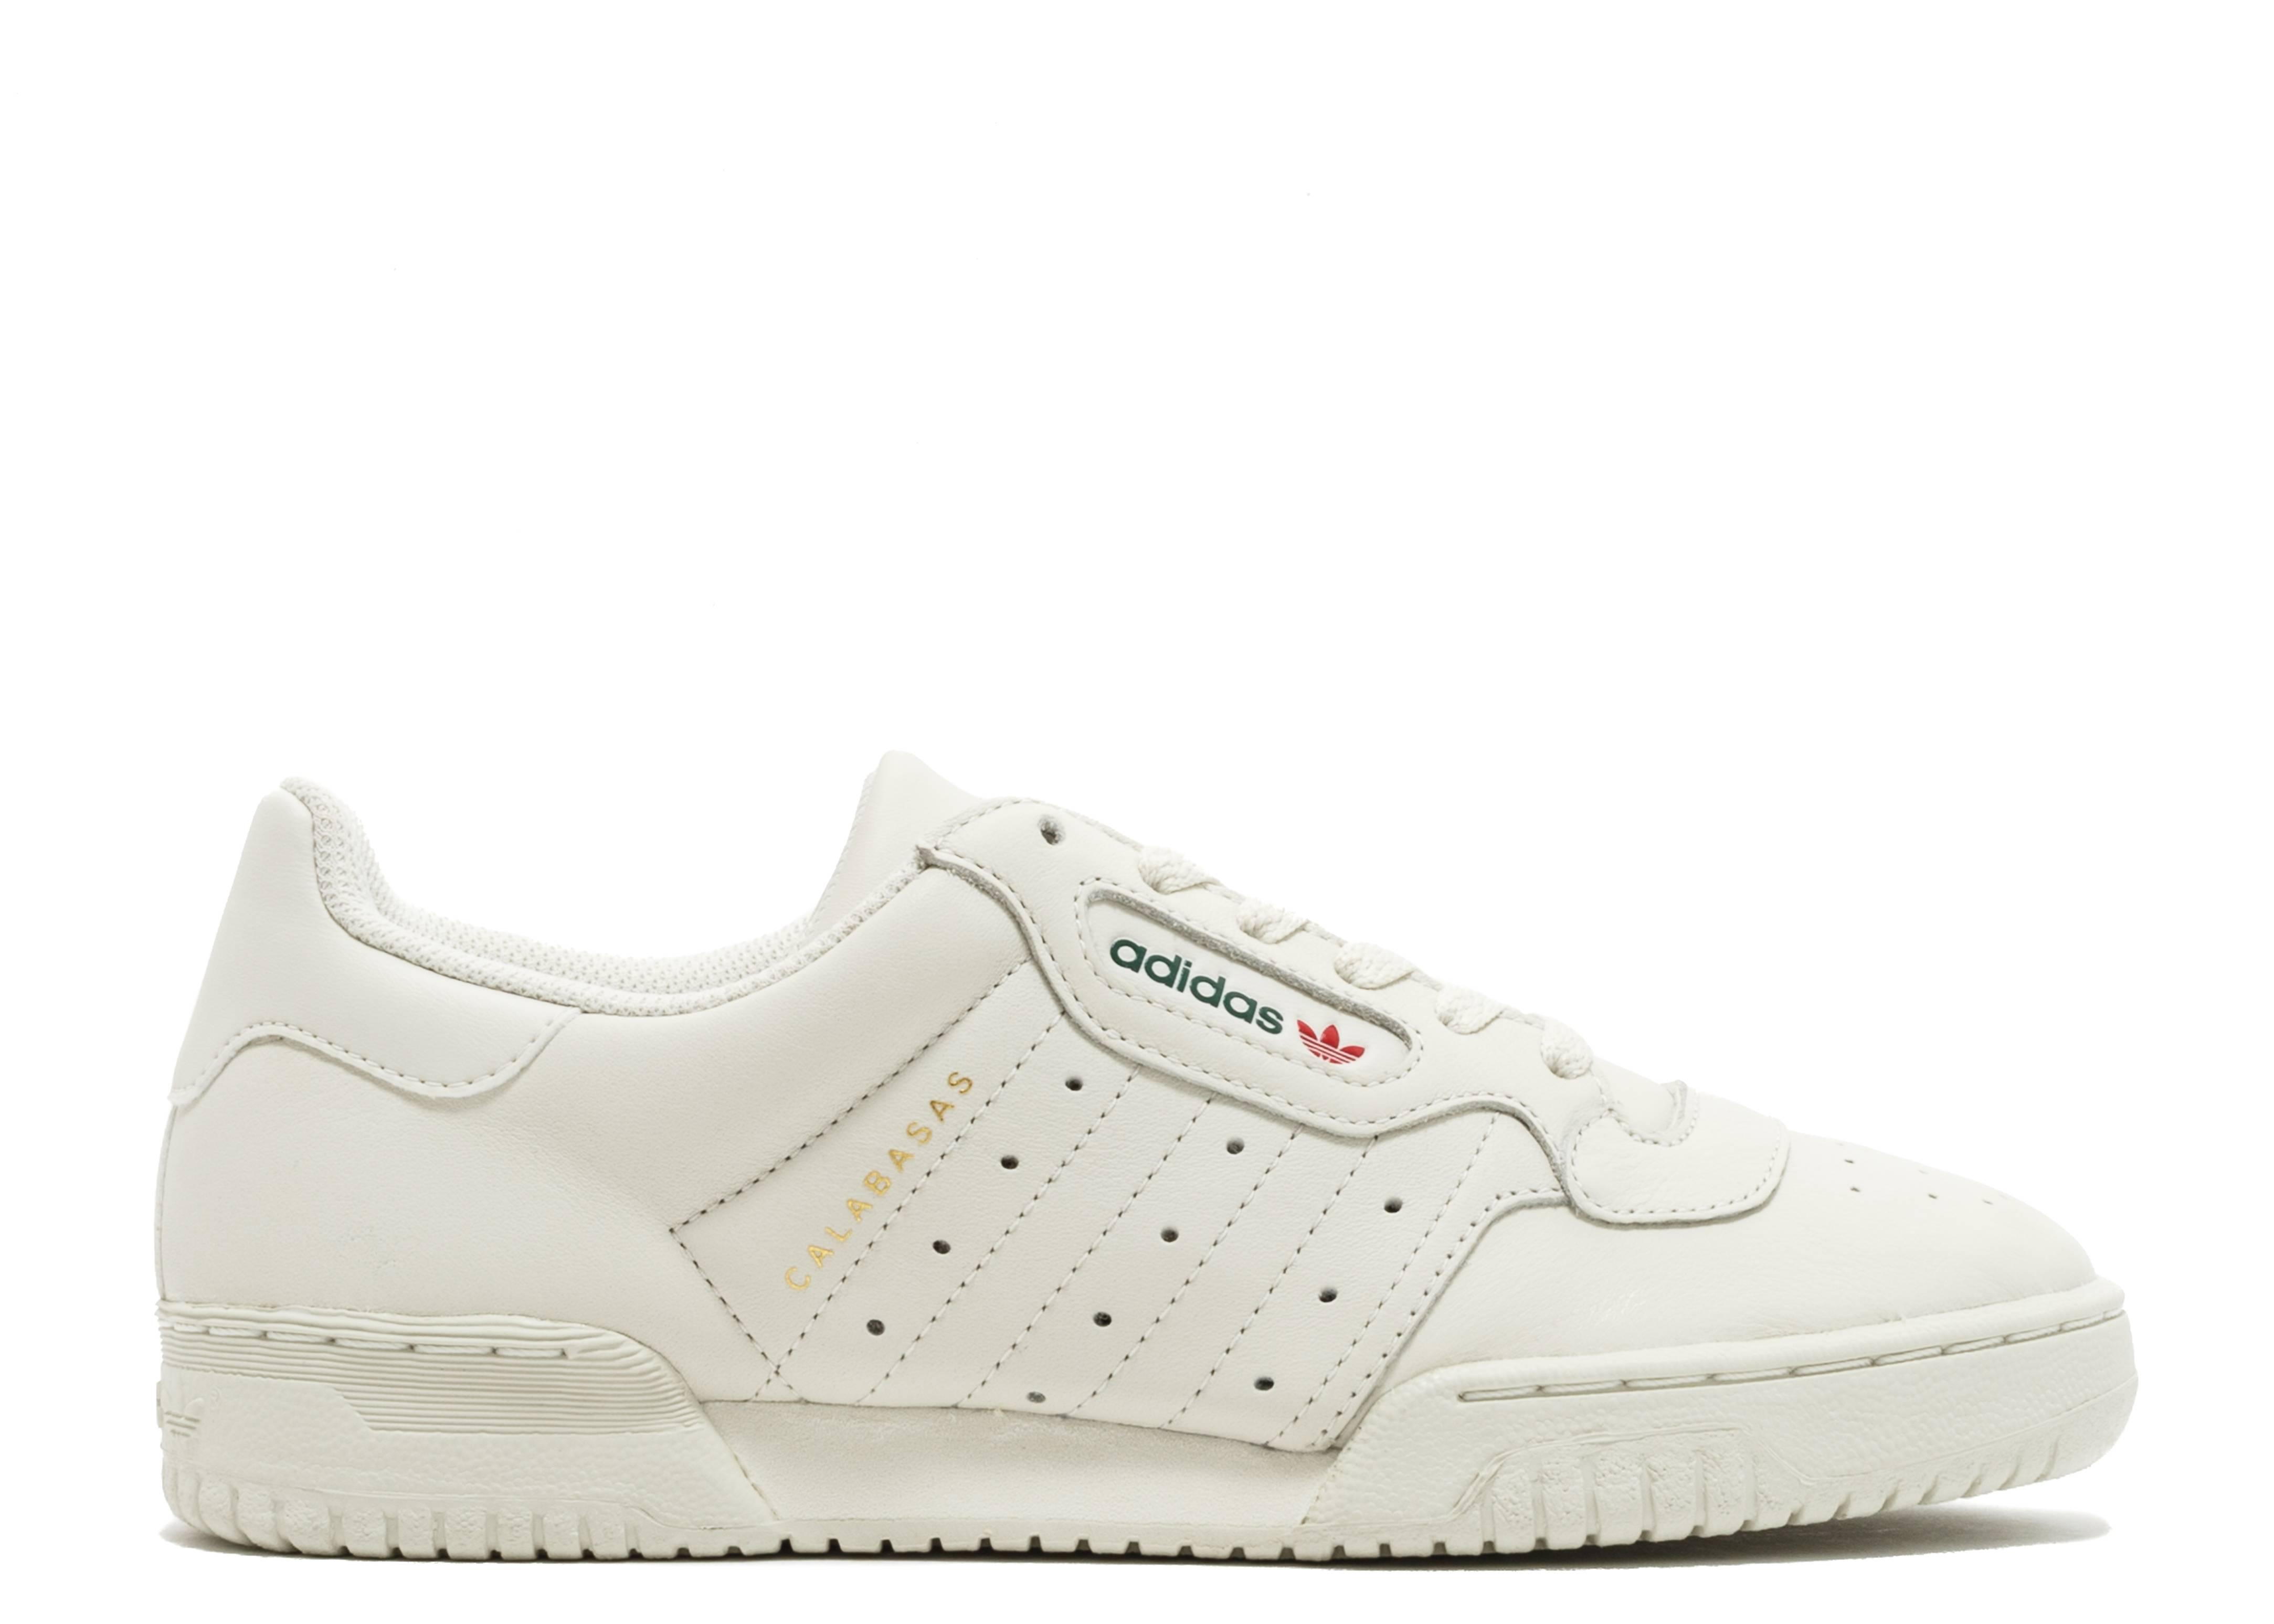 adidas calabasas scarpe